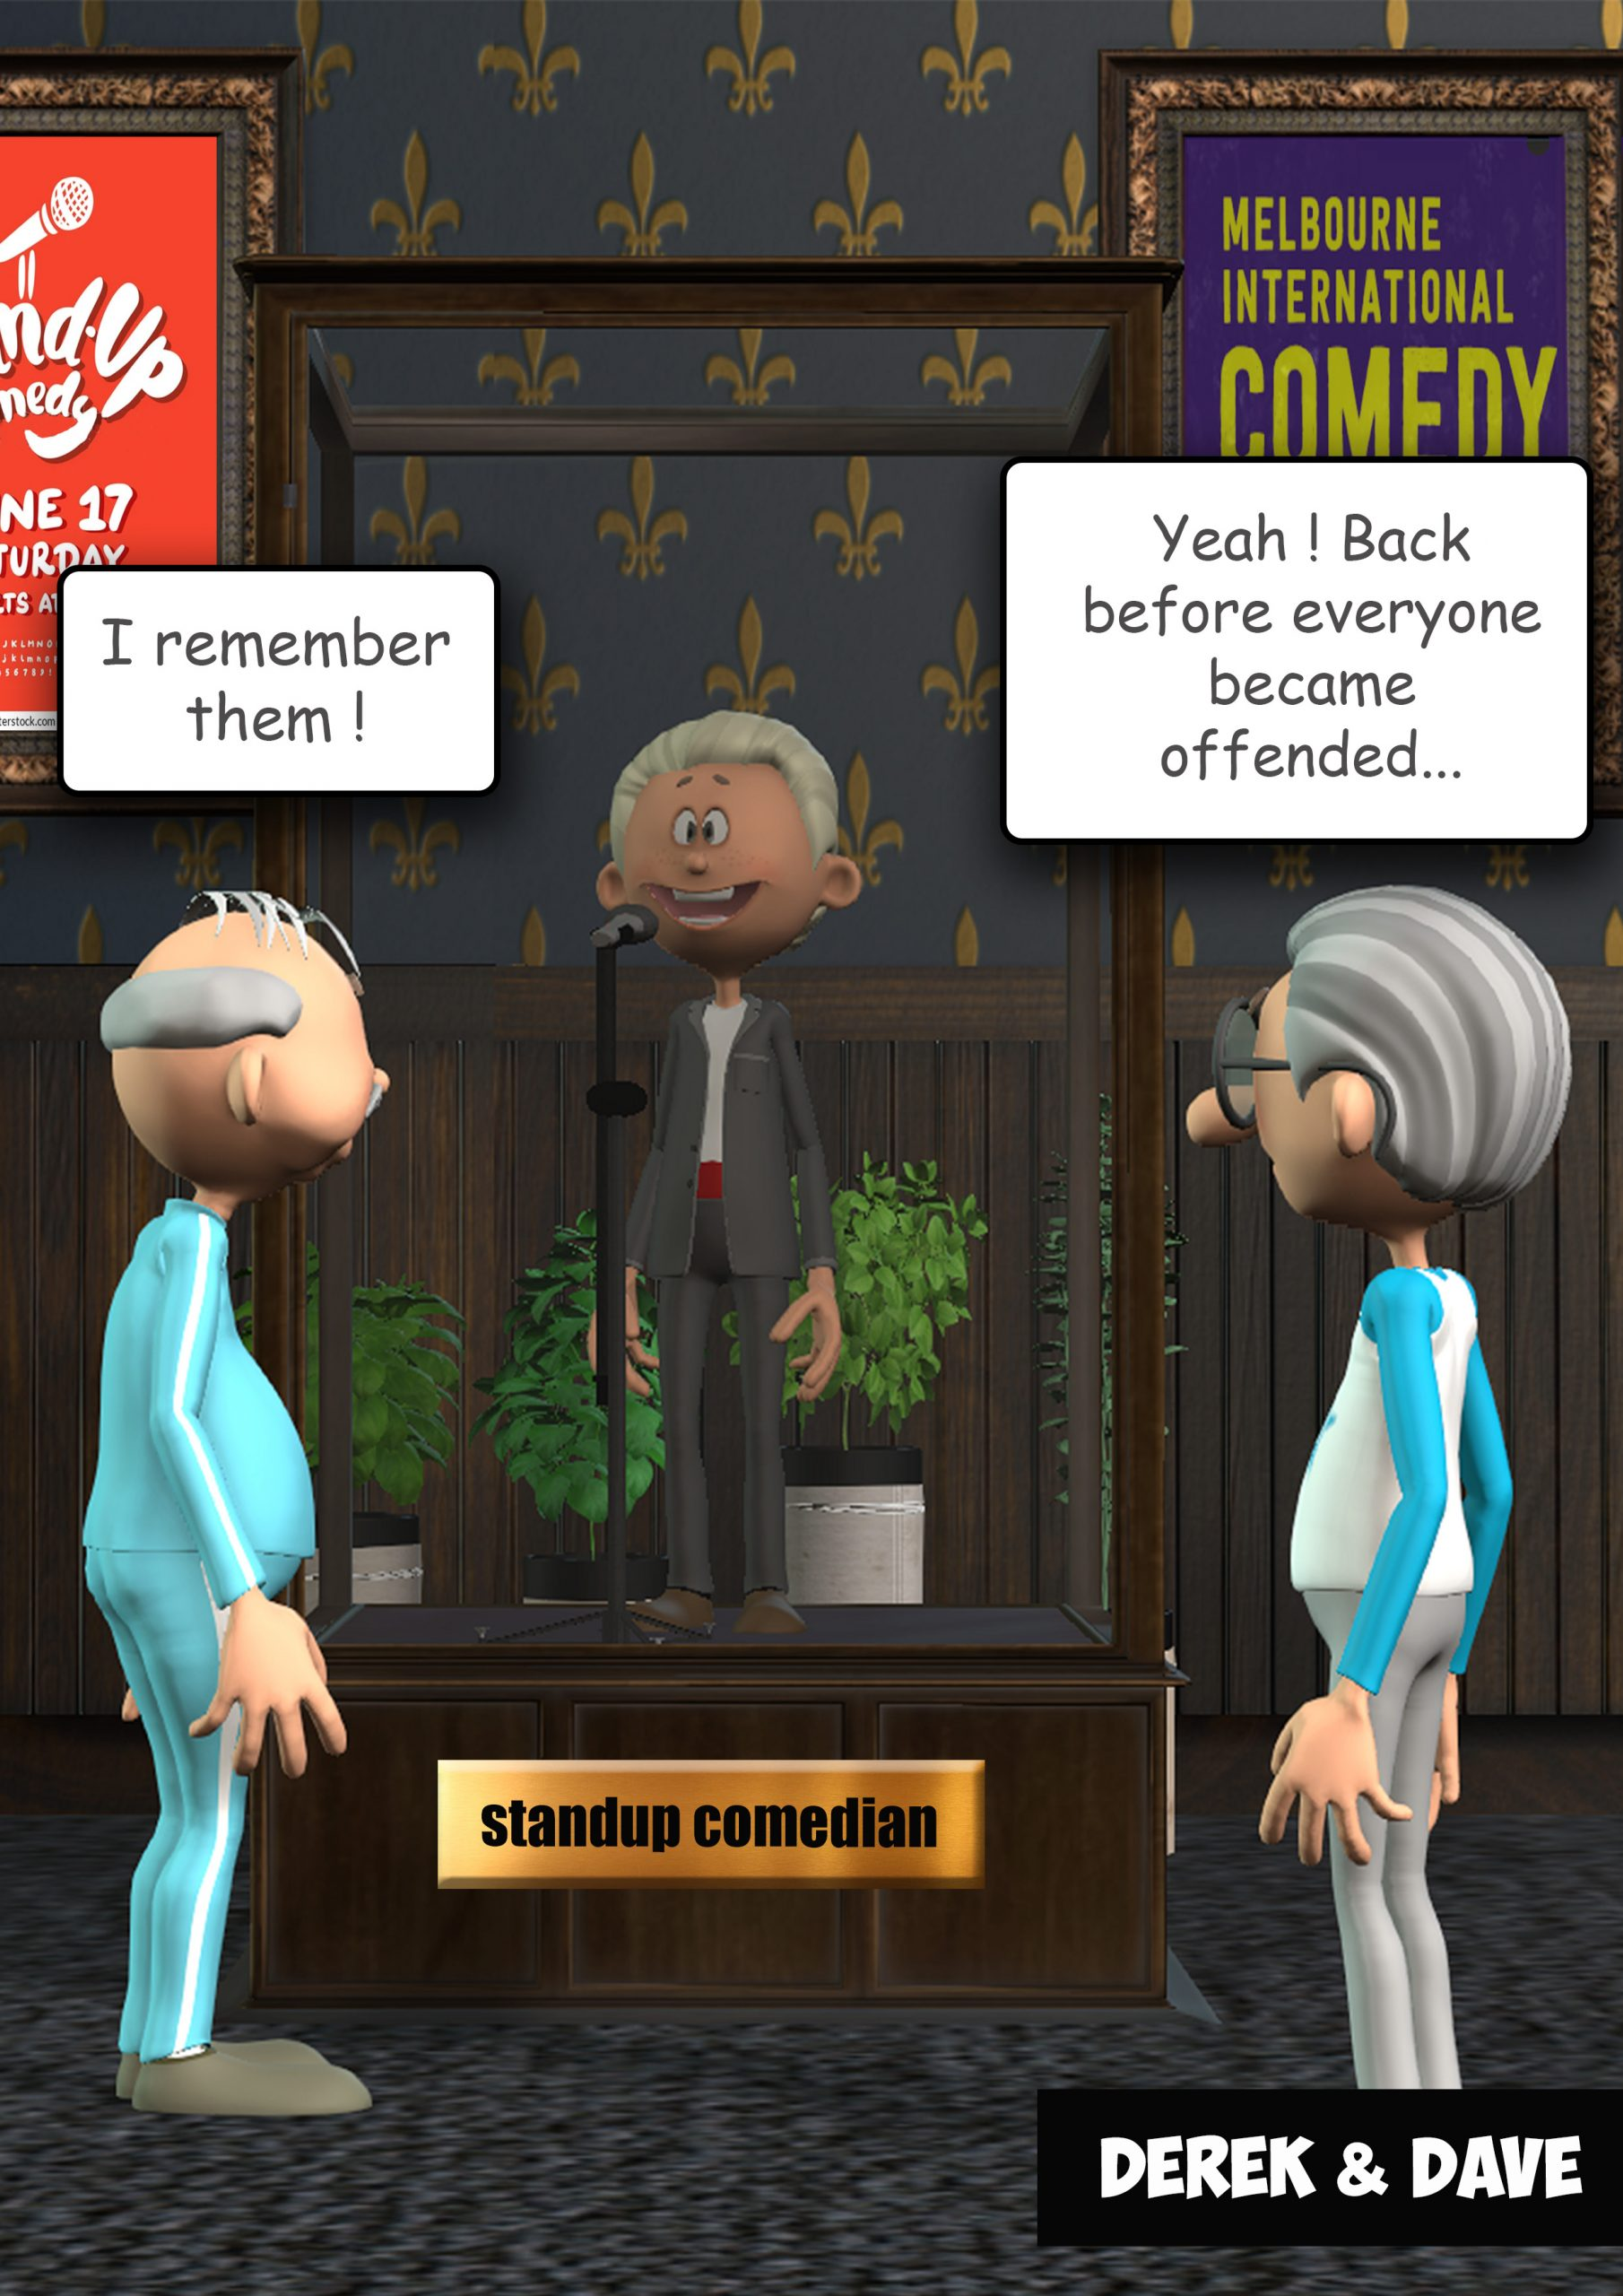 Comedian Display